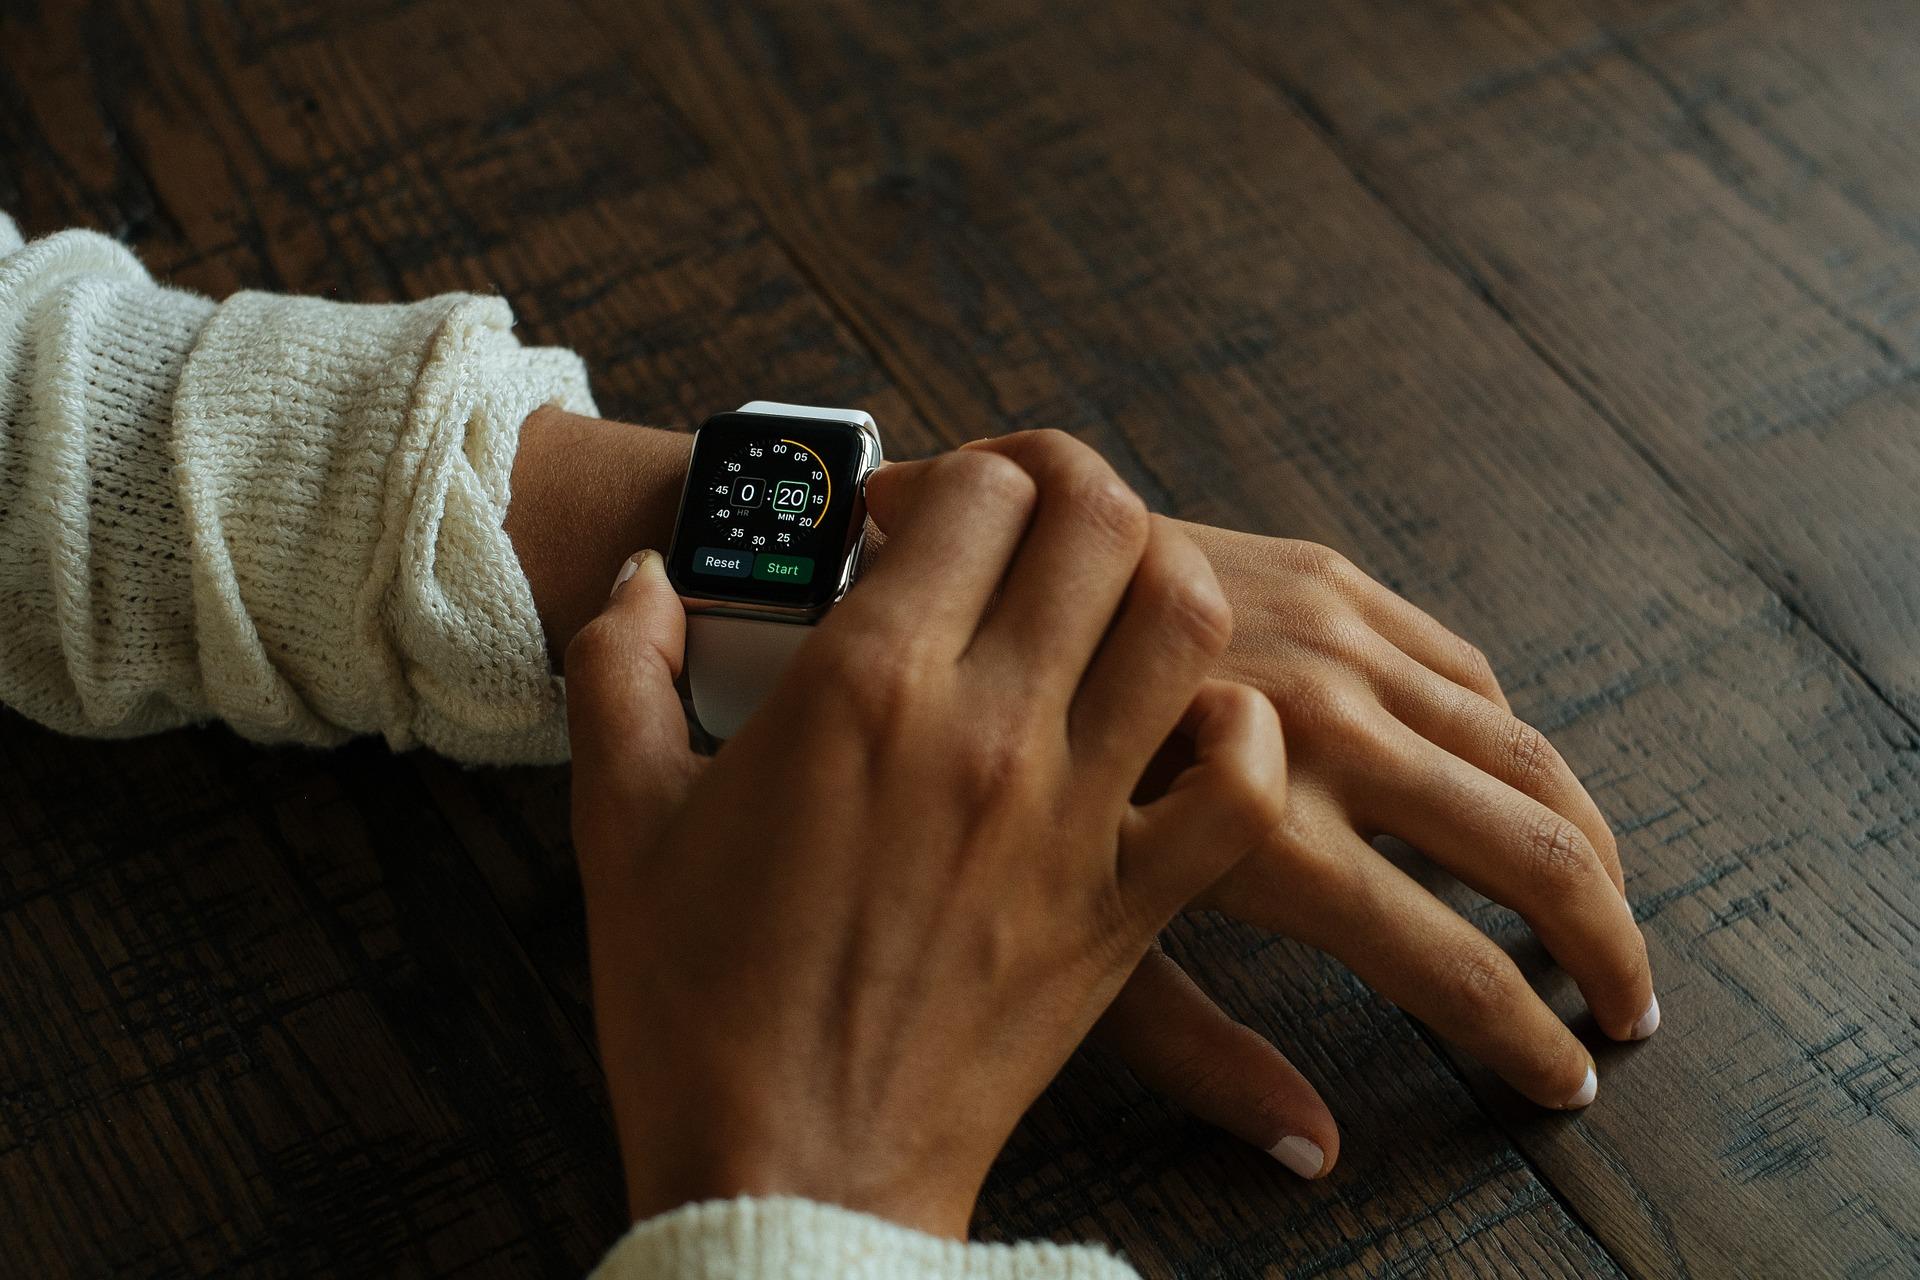 smart-watch features